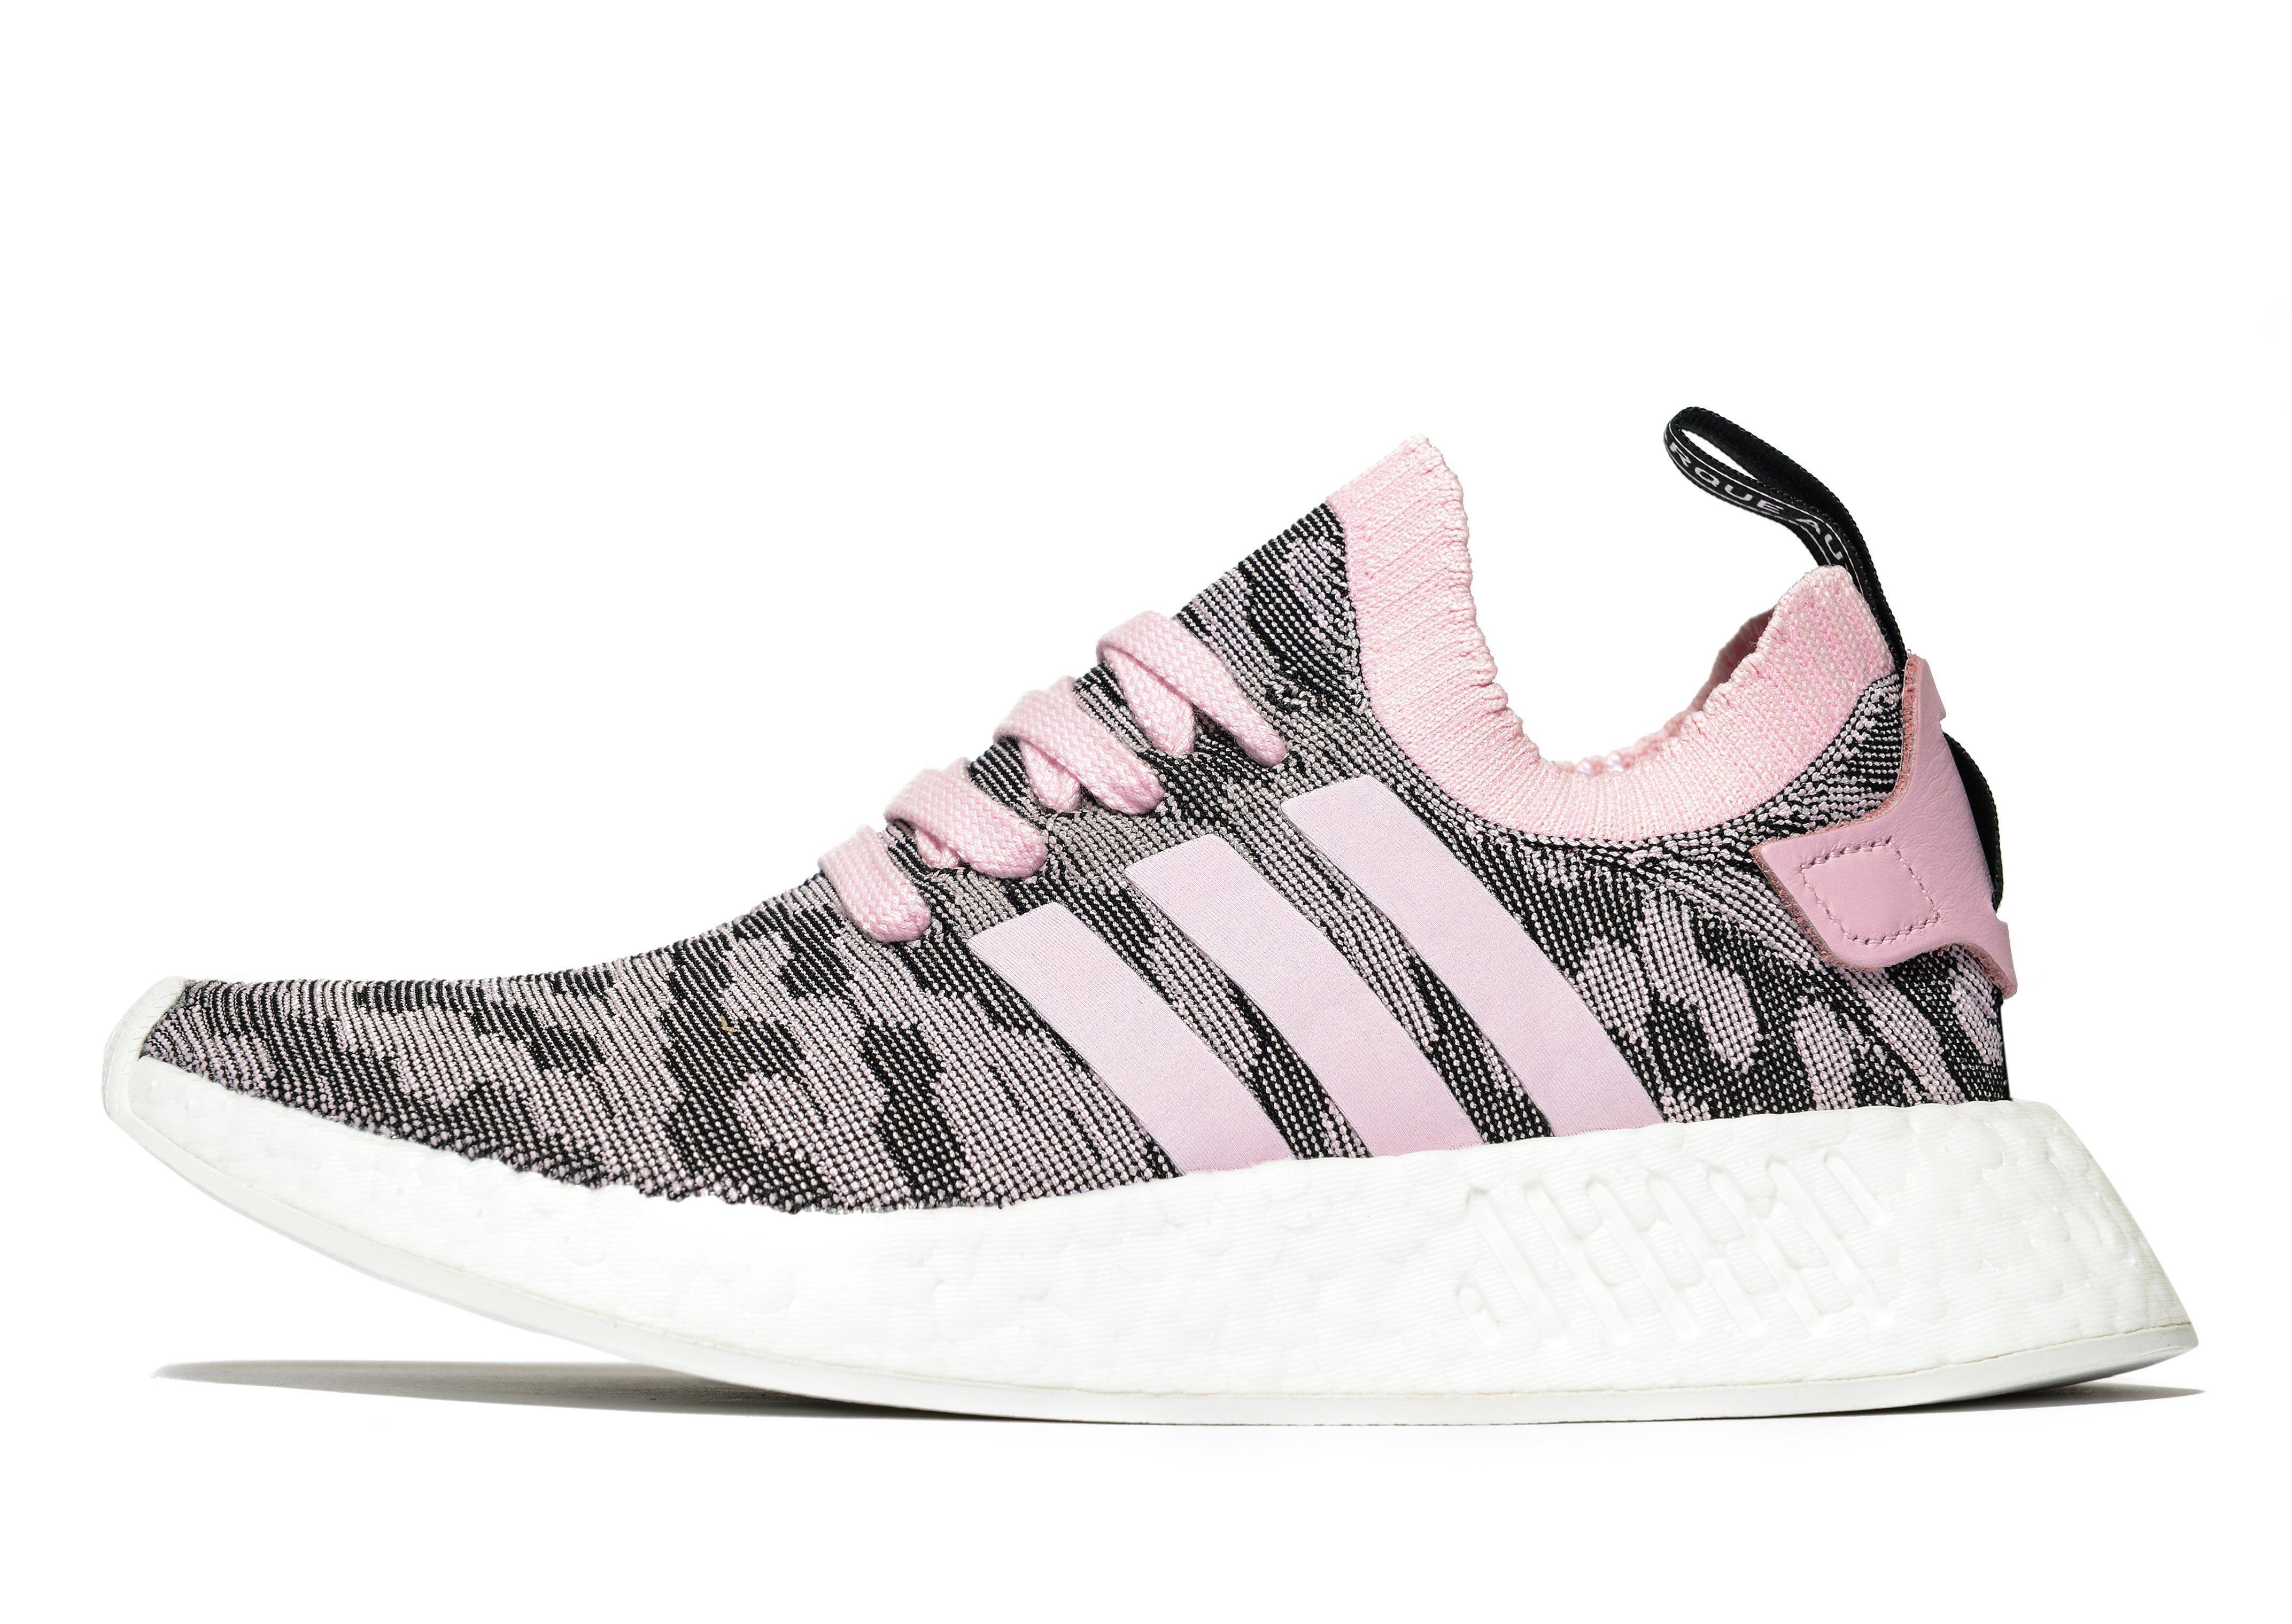 quality design 34565 38fea Lyst - adidas Originals Nmd R2 in Pink